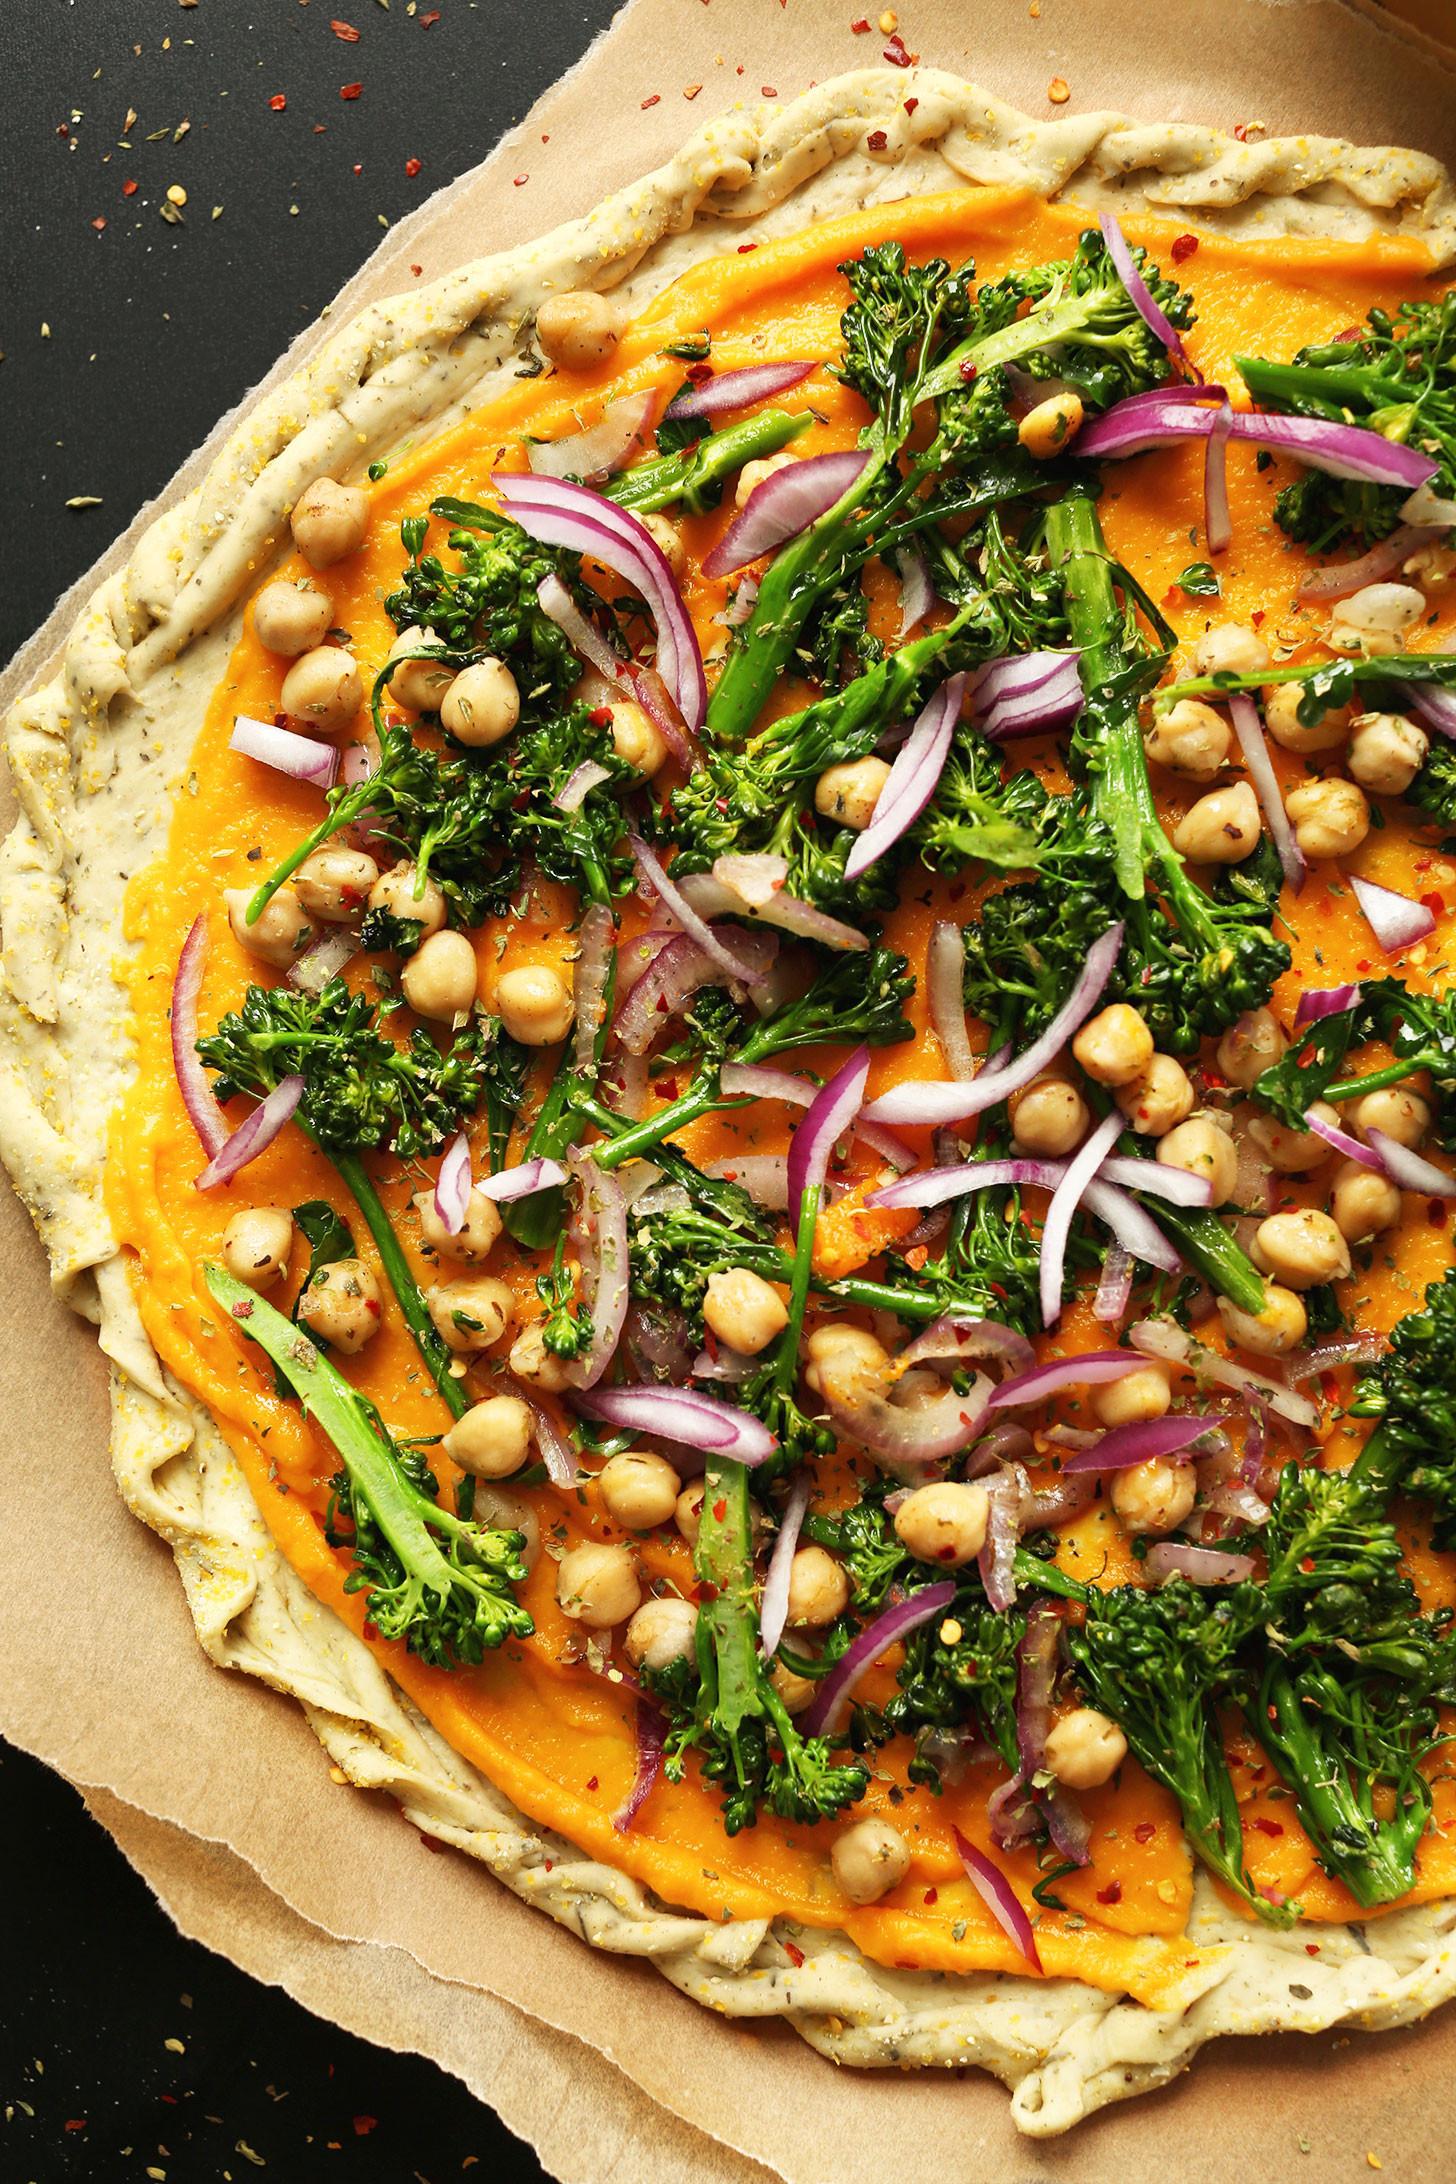 Best Vegetarian Dinner Recipes  Ultimate Vegan Pizza Recipe Round Up